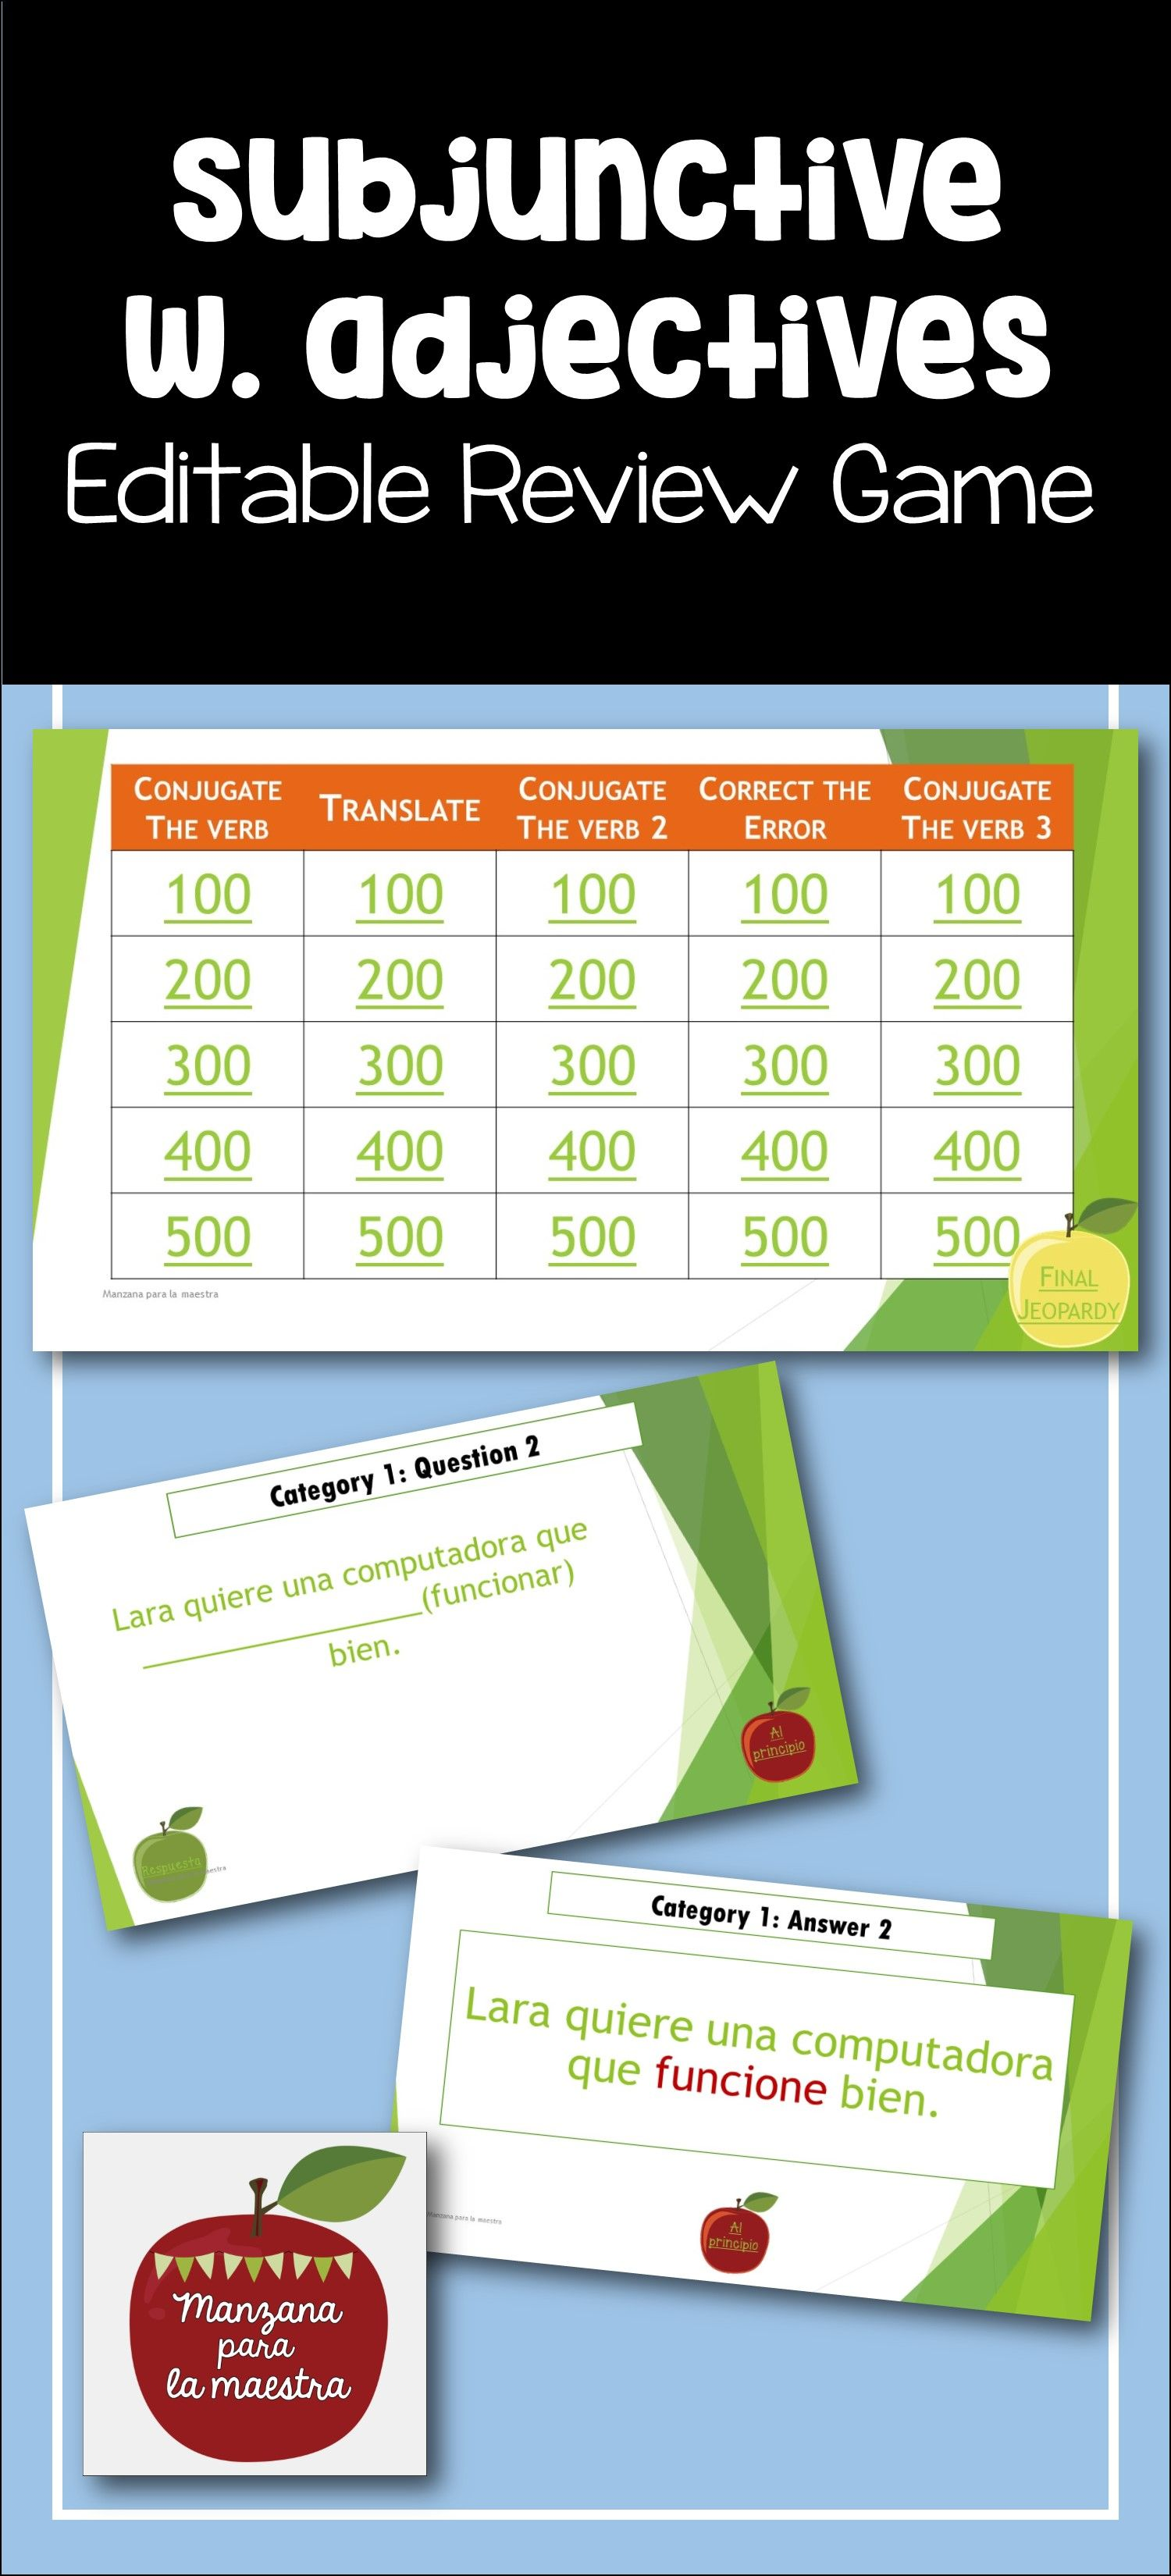 Spanish Subjunctive With Adjectival Phrases Editable Review Game El Subjuntivo Review Games El Subjuntivo Spanish Teaching Resources [ 3300 x 1500 Pixel ]